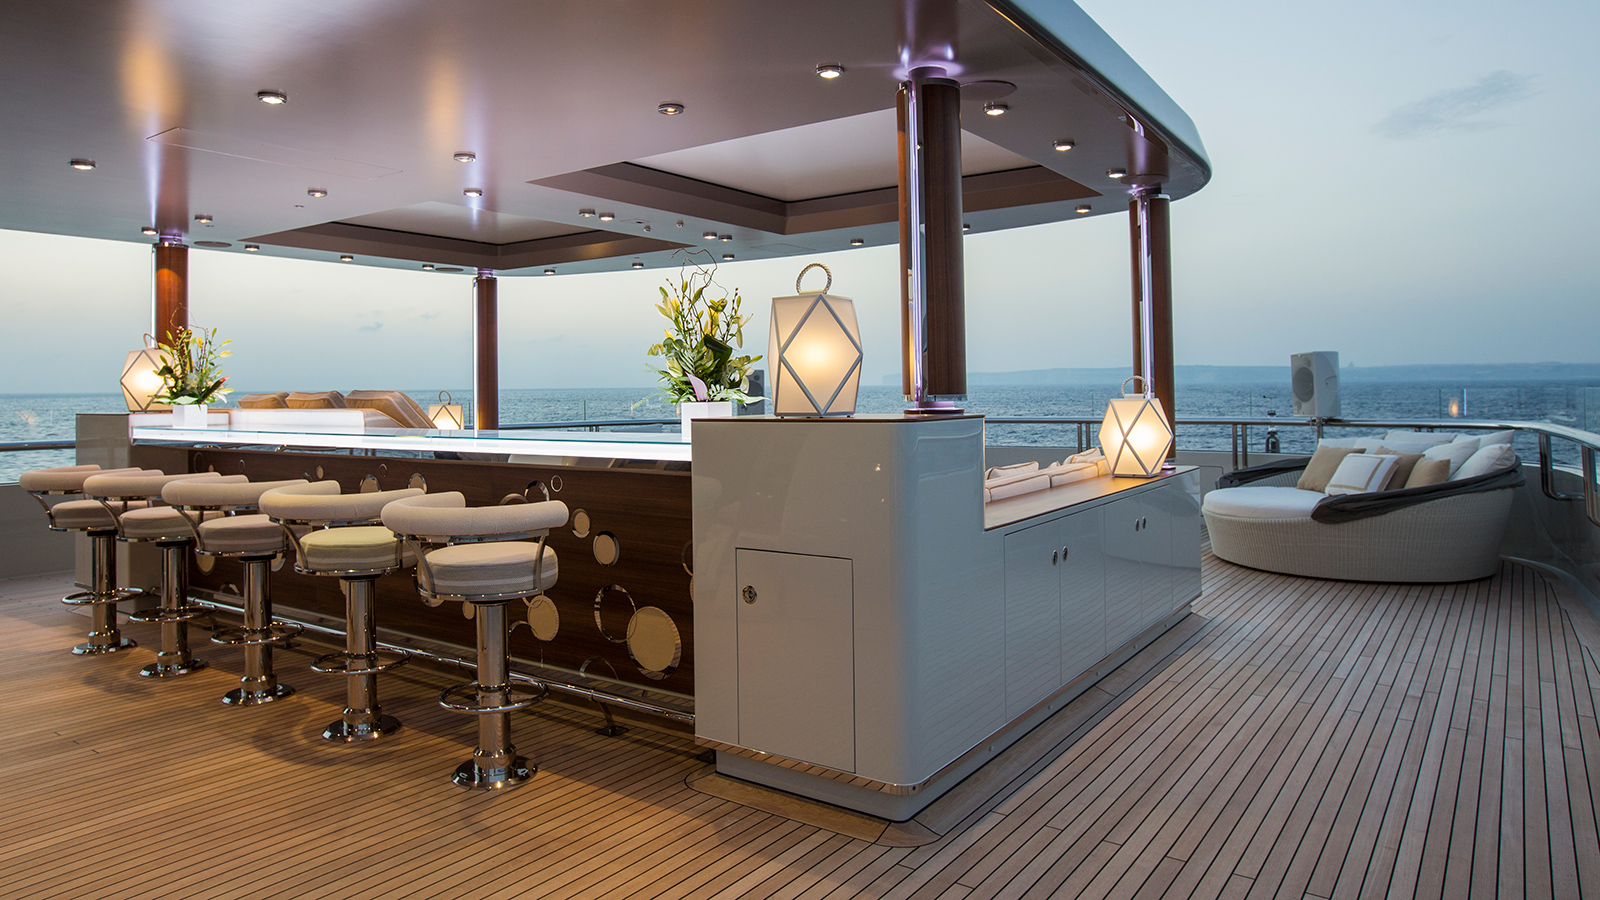 the-sundeck-bar-of-the-lurssen-superyacht-polar-star